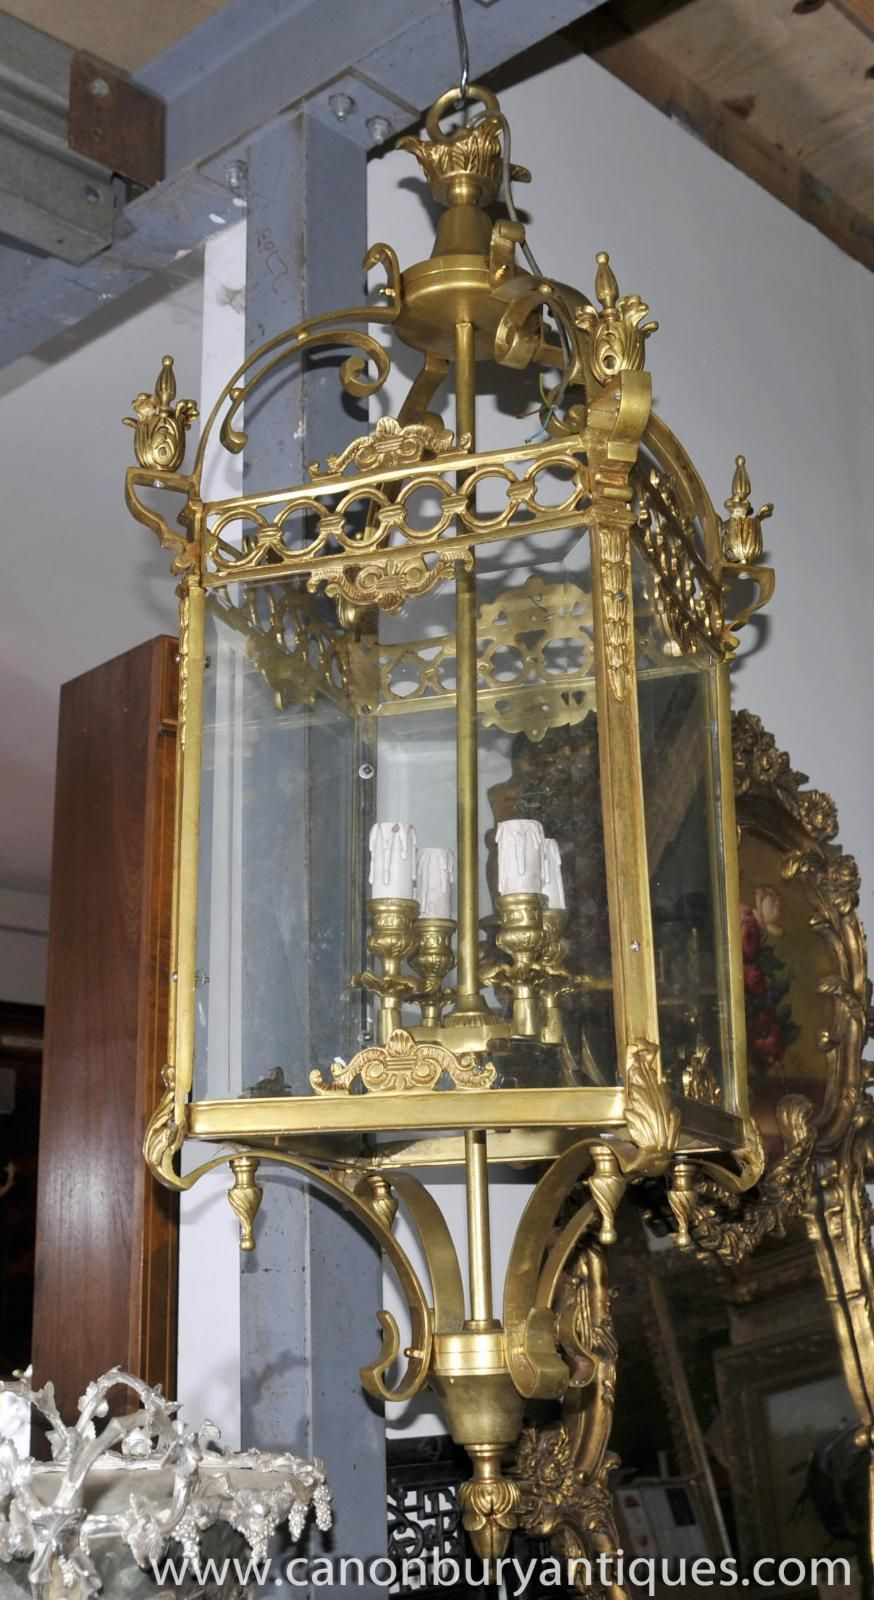 Photo of Large French Empire Brass Lantern Chandelier Light - Photo Of Large French Empire Brass Lantern Chandelier Light